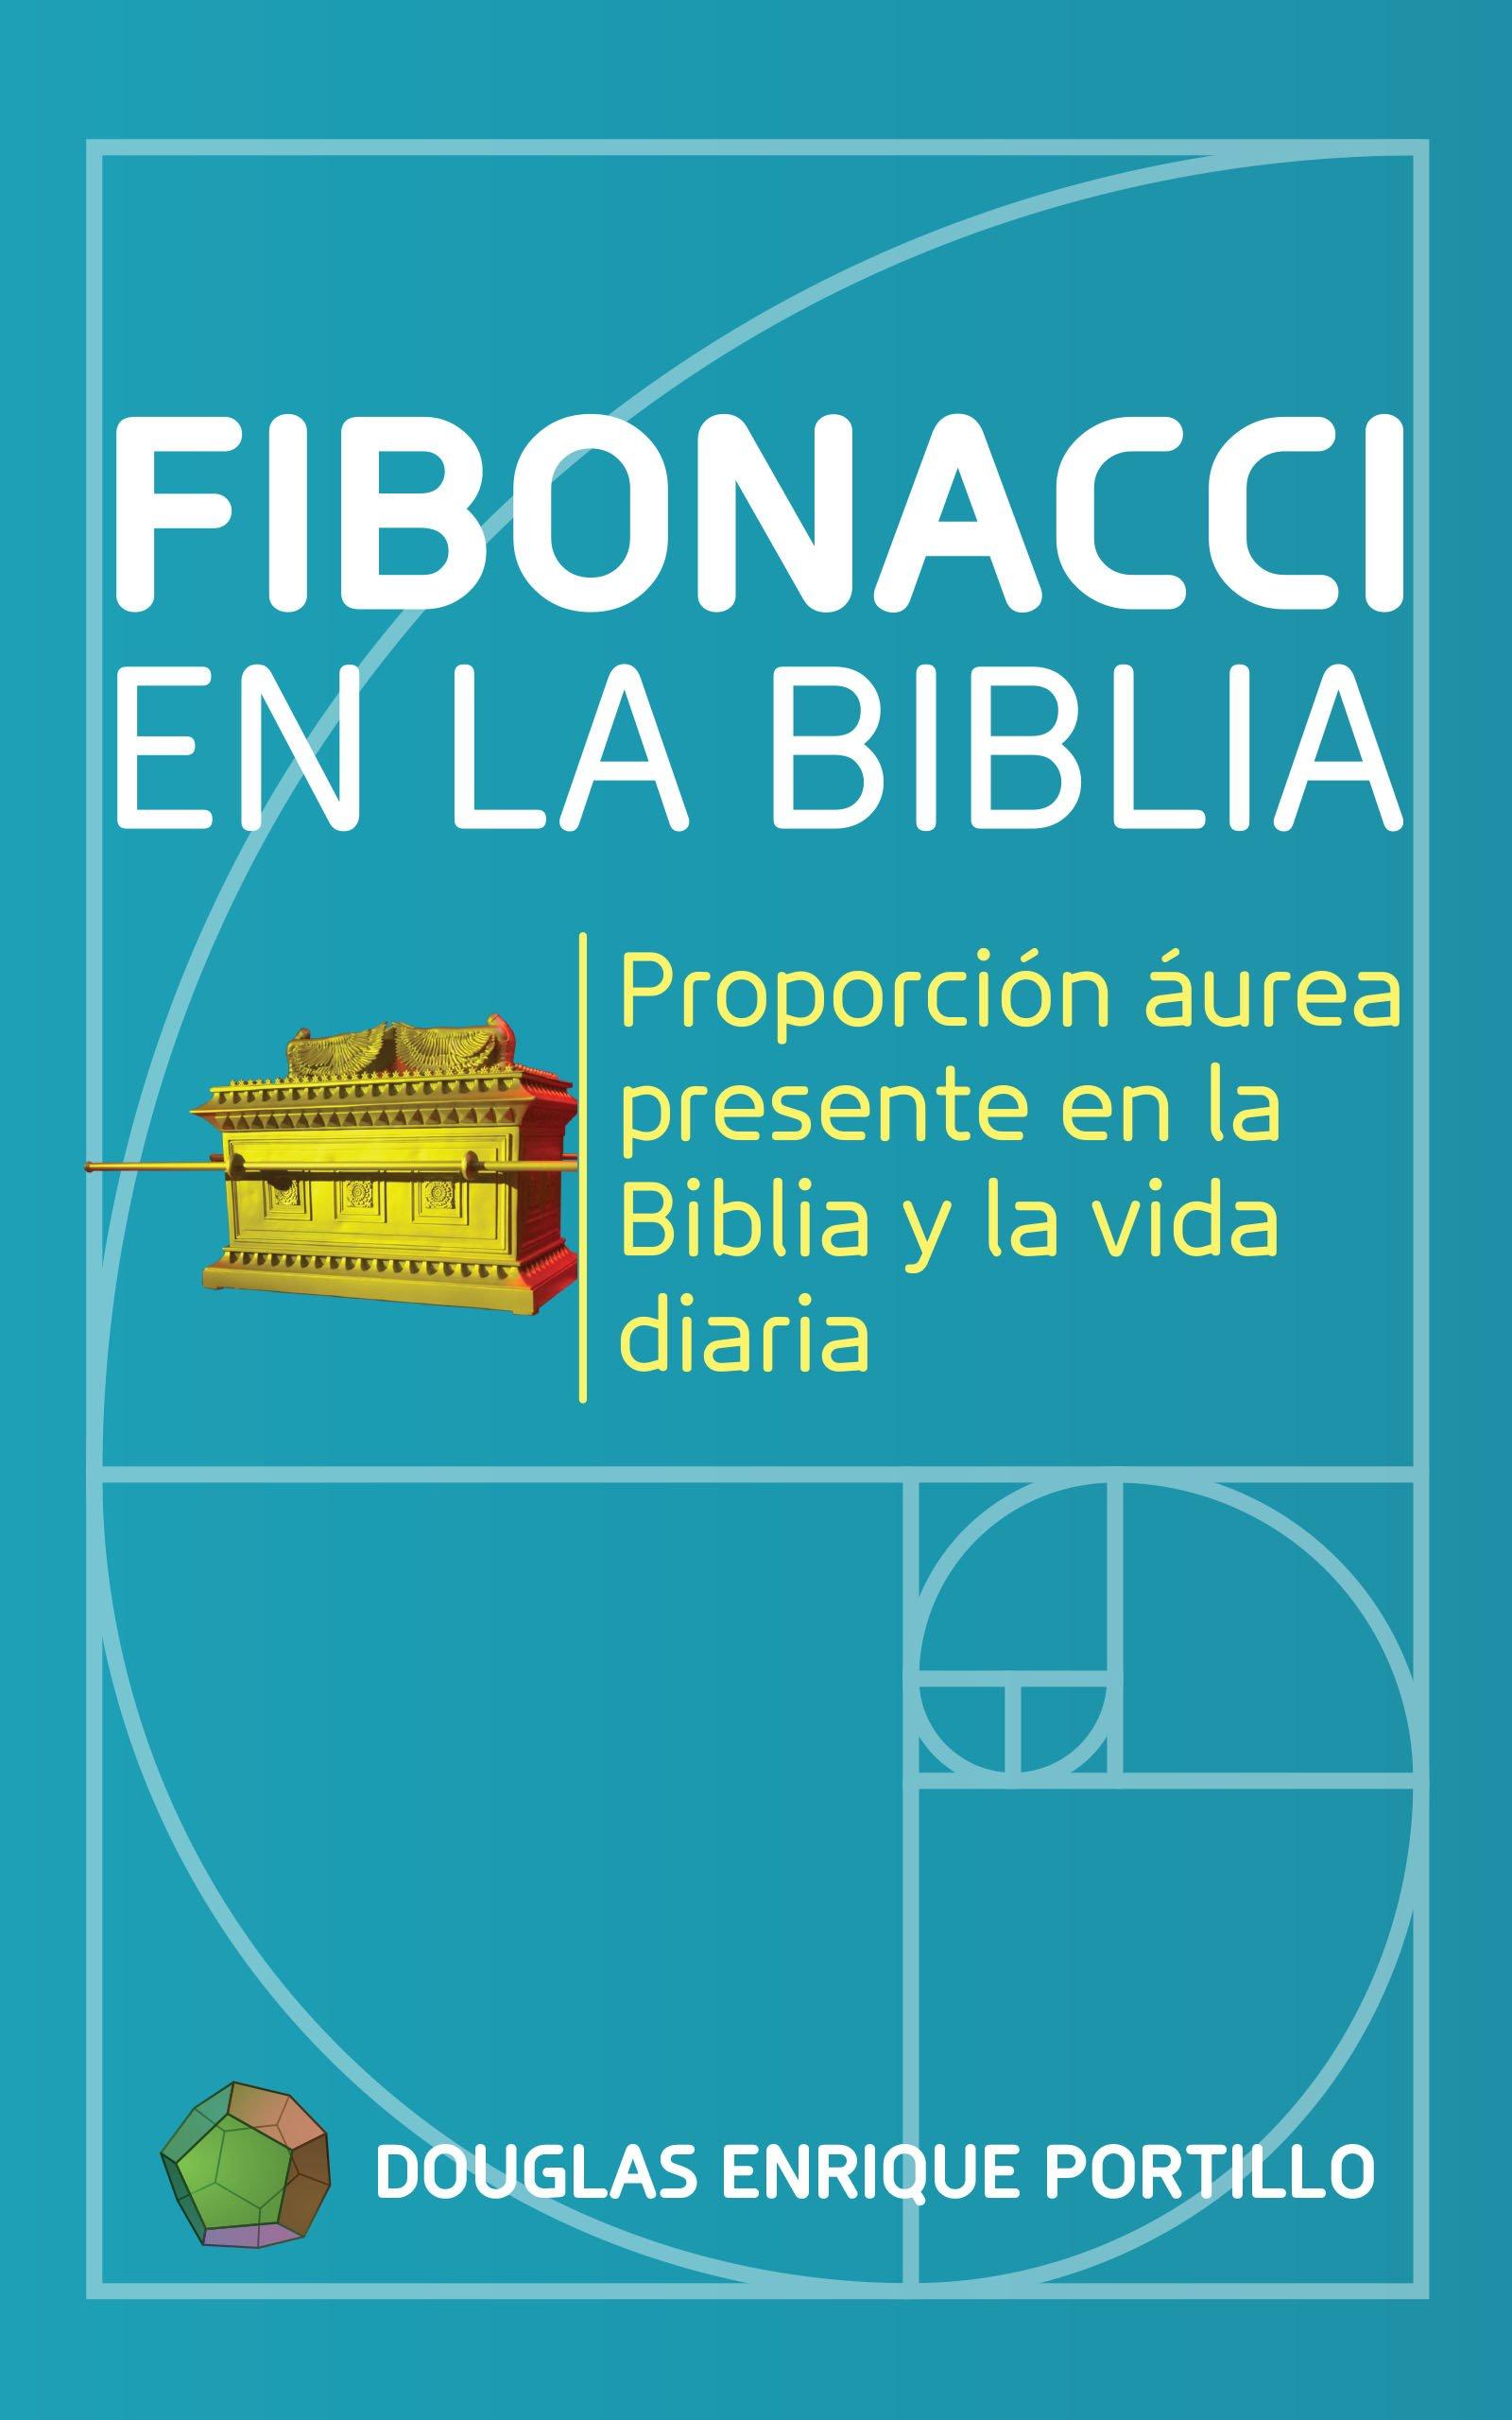 Fibonacci en la biblia, de Douglas Enrique Portillo